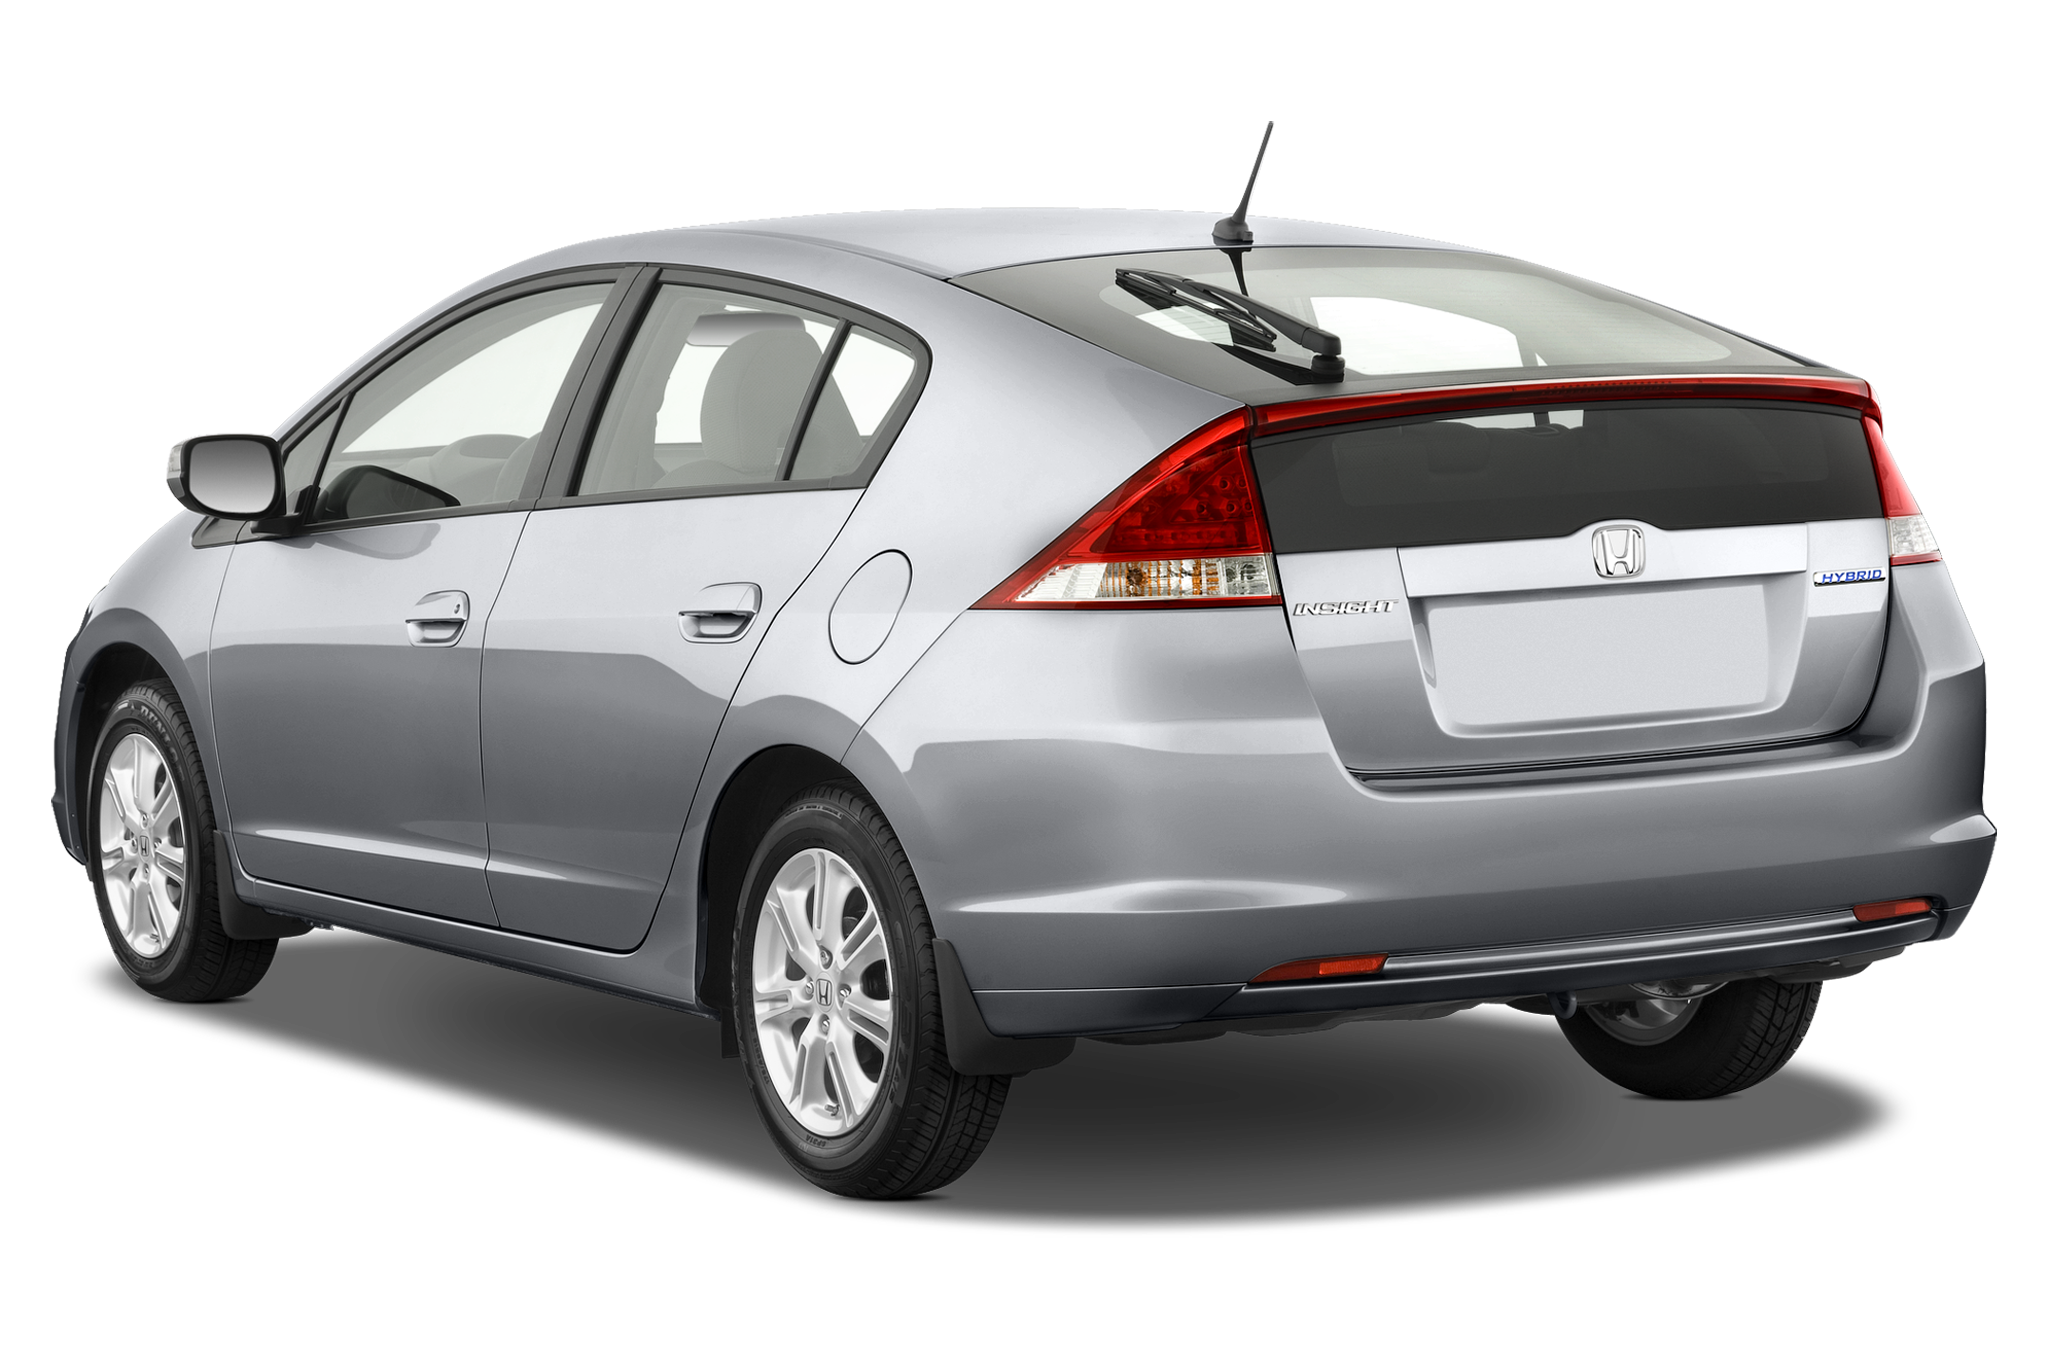 2010 honda insight fuel efficient cars hybrids and. Black Bedroom Furniture Sets. Home Design Ideas